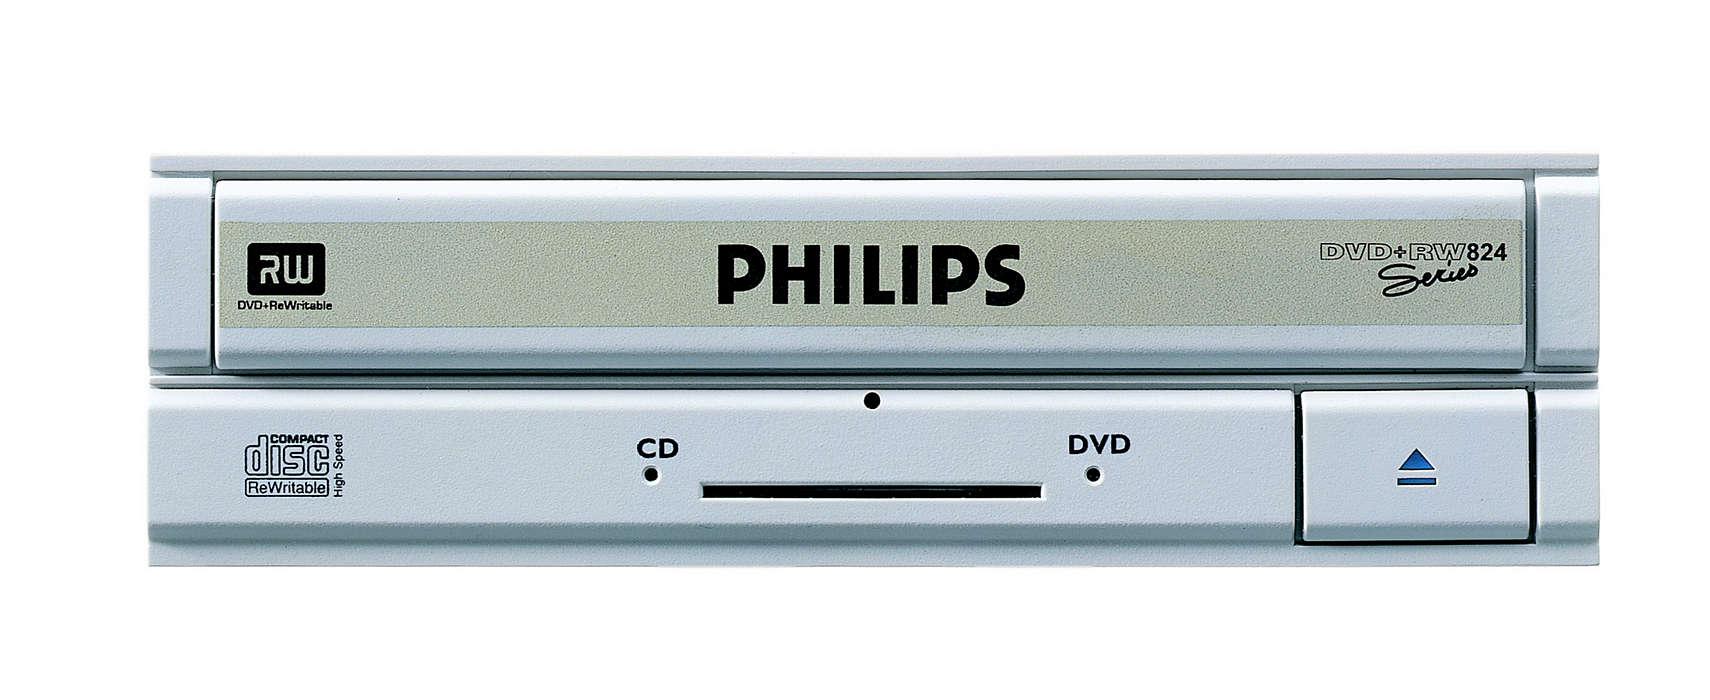 Registra i DVD a una velocità straordinaria